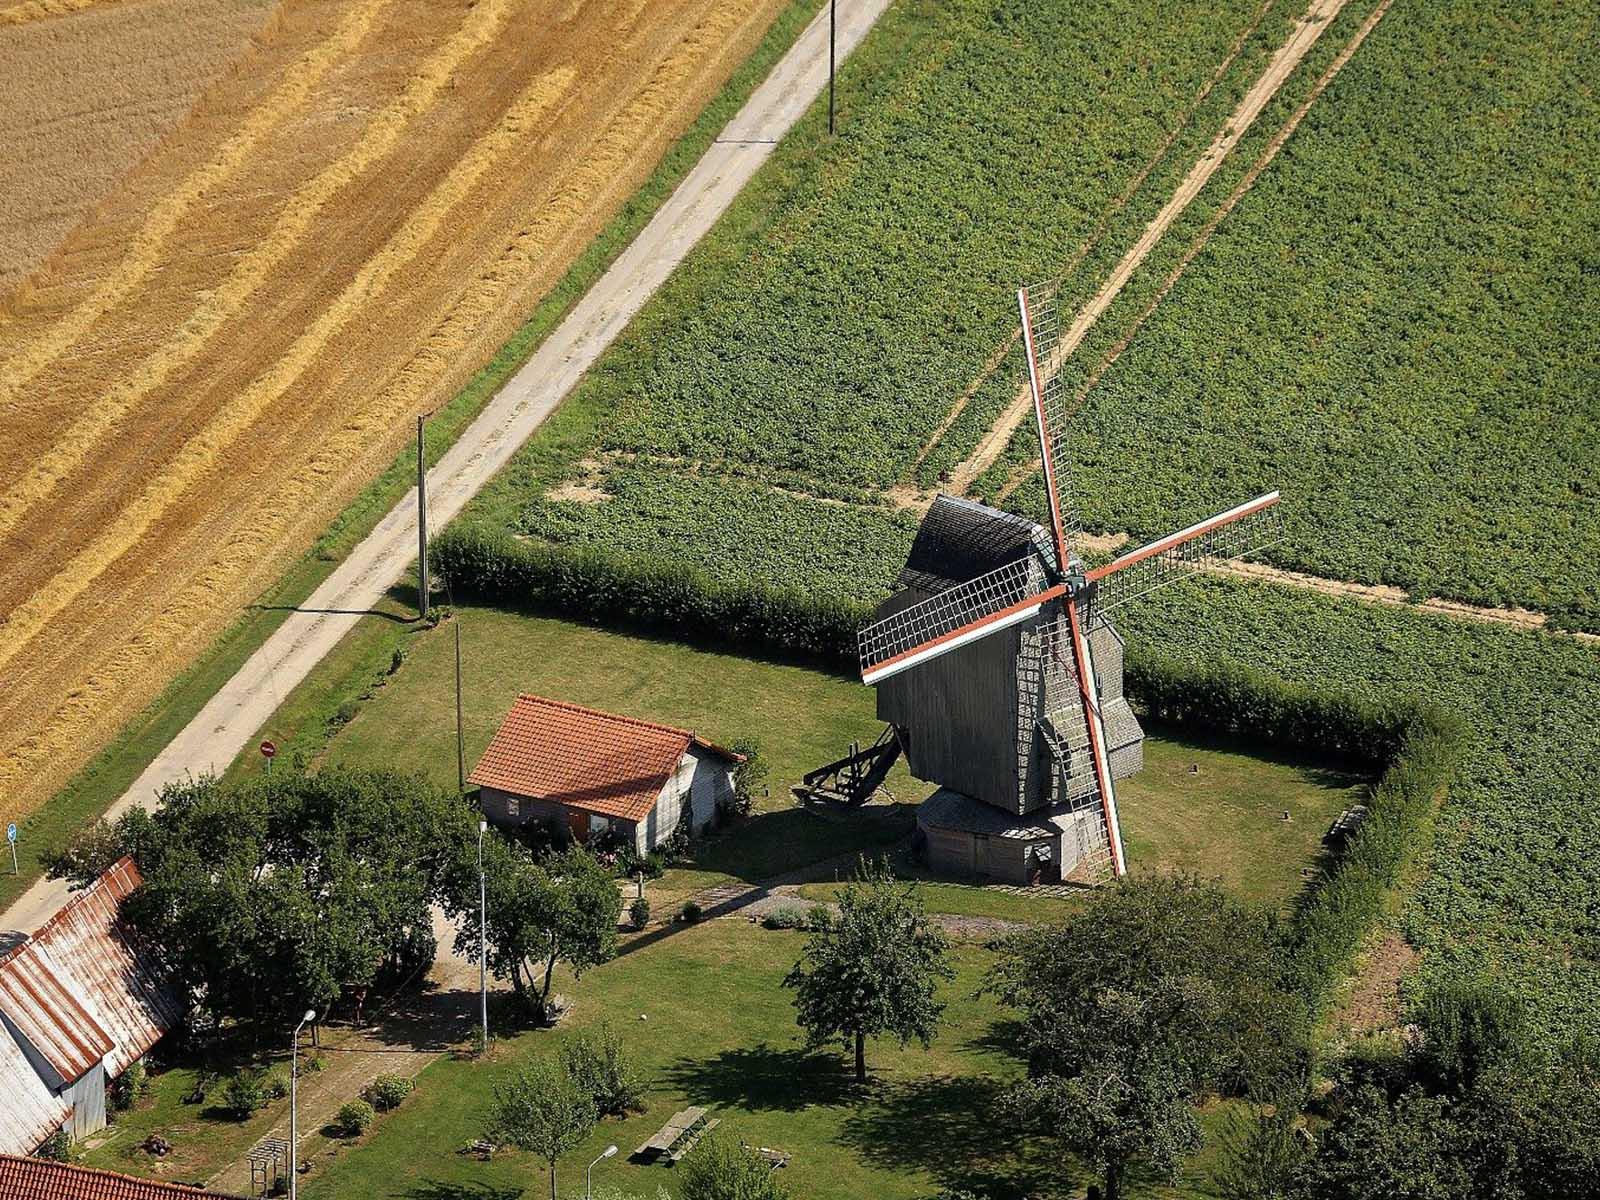 banniere-moulin-deschodt-wormhout.jpg